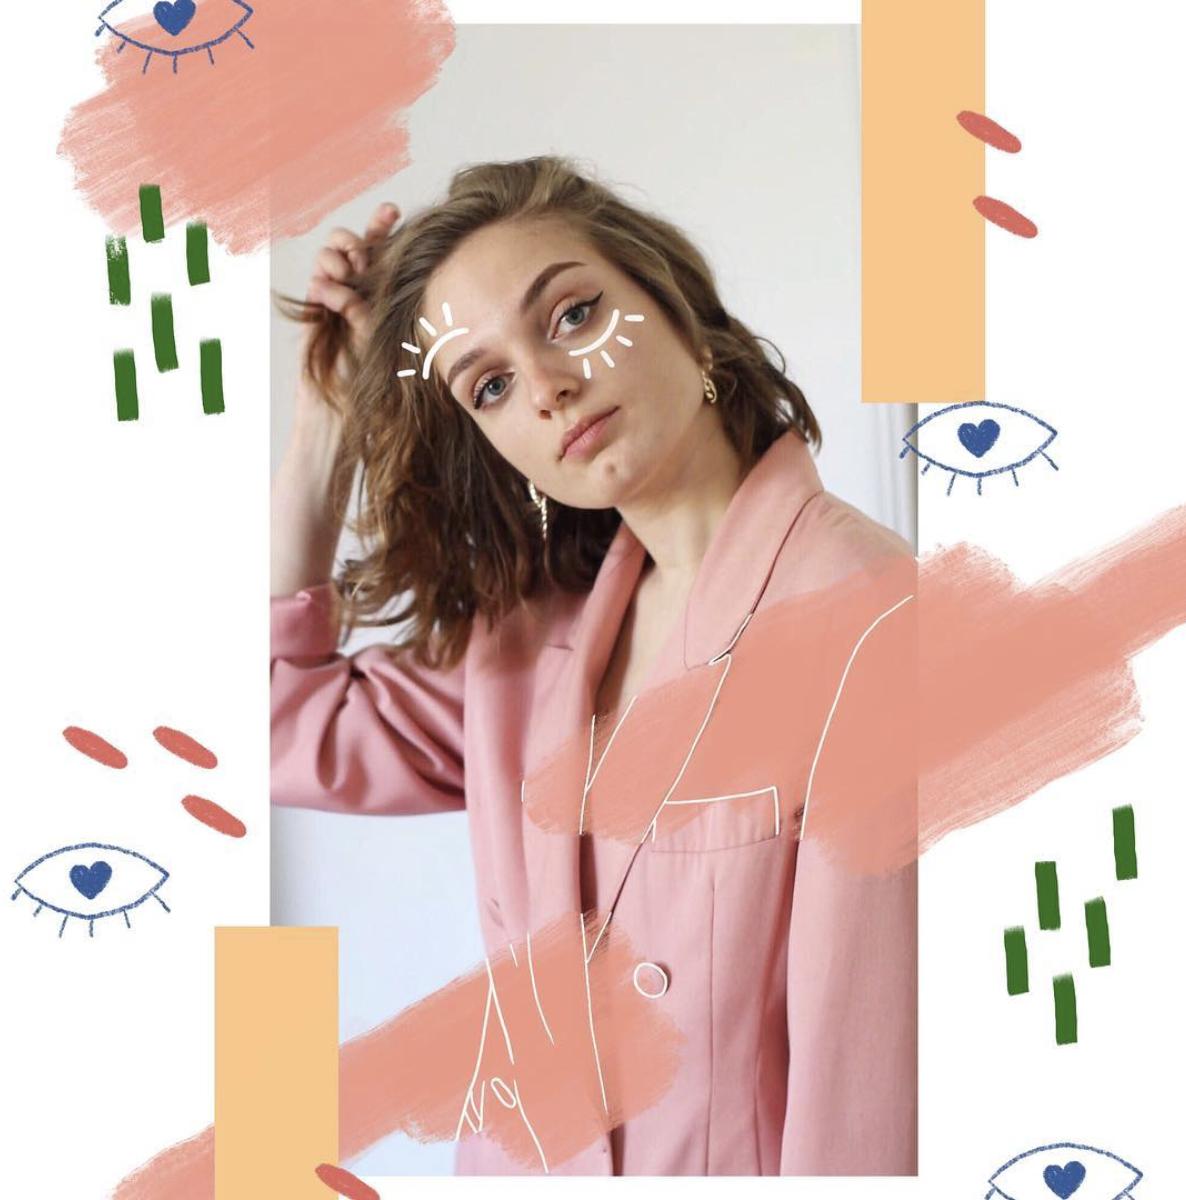 an interview with Louisa Schwartz aka @ectomorphe